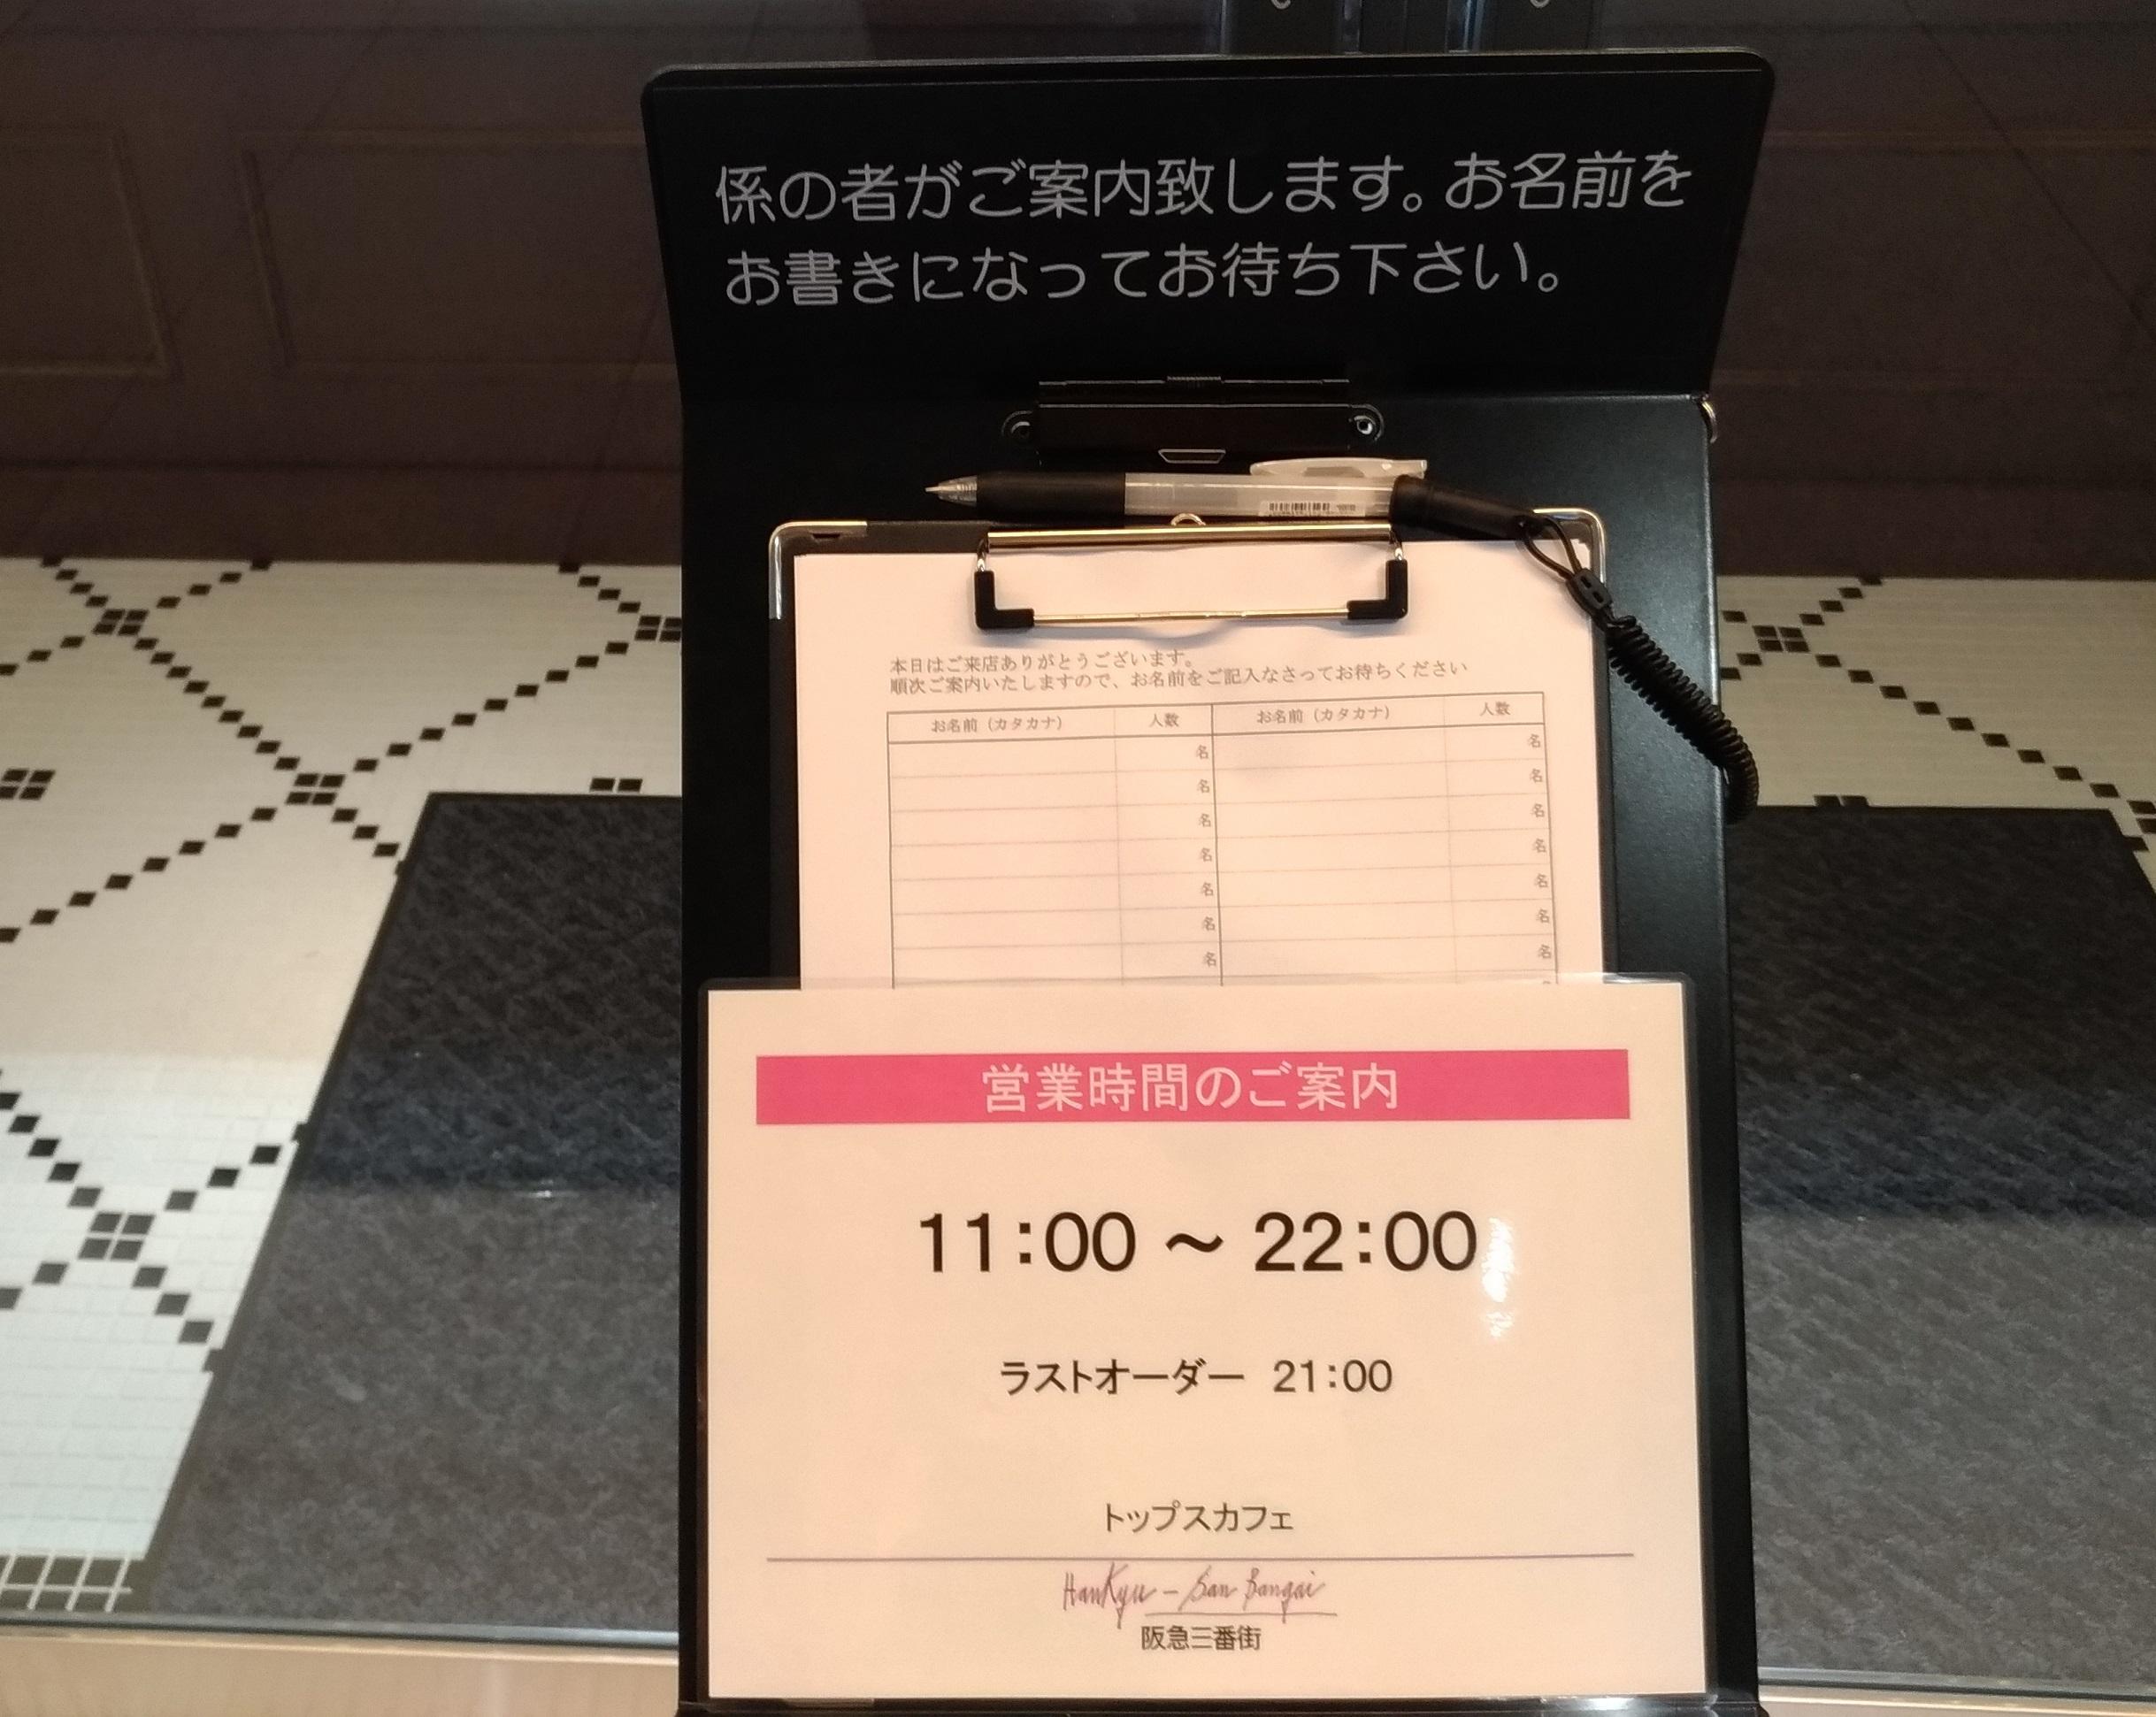 tops_cafe_umeda_osaka_0715_1.jpg